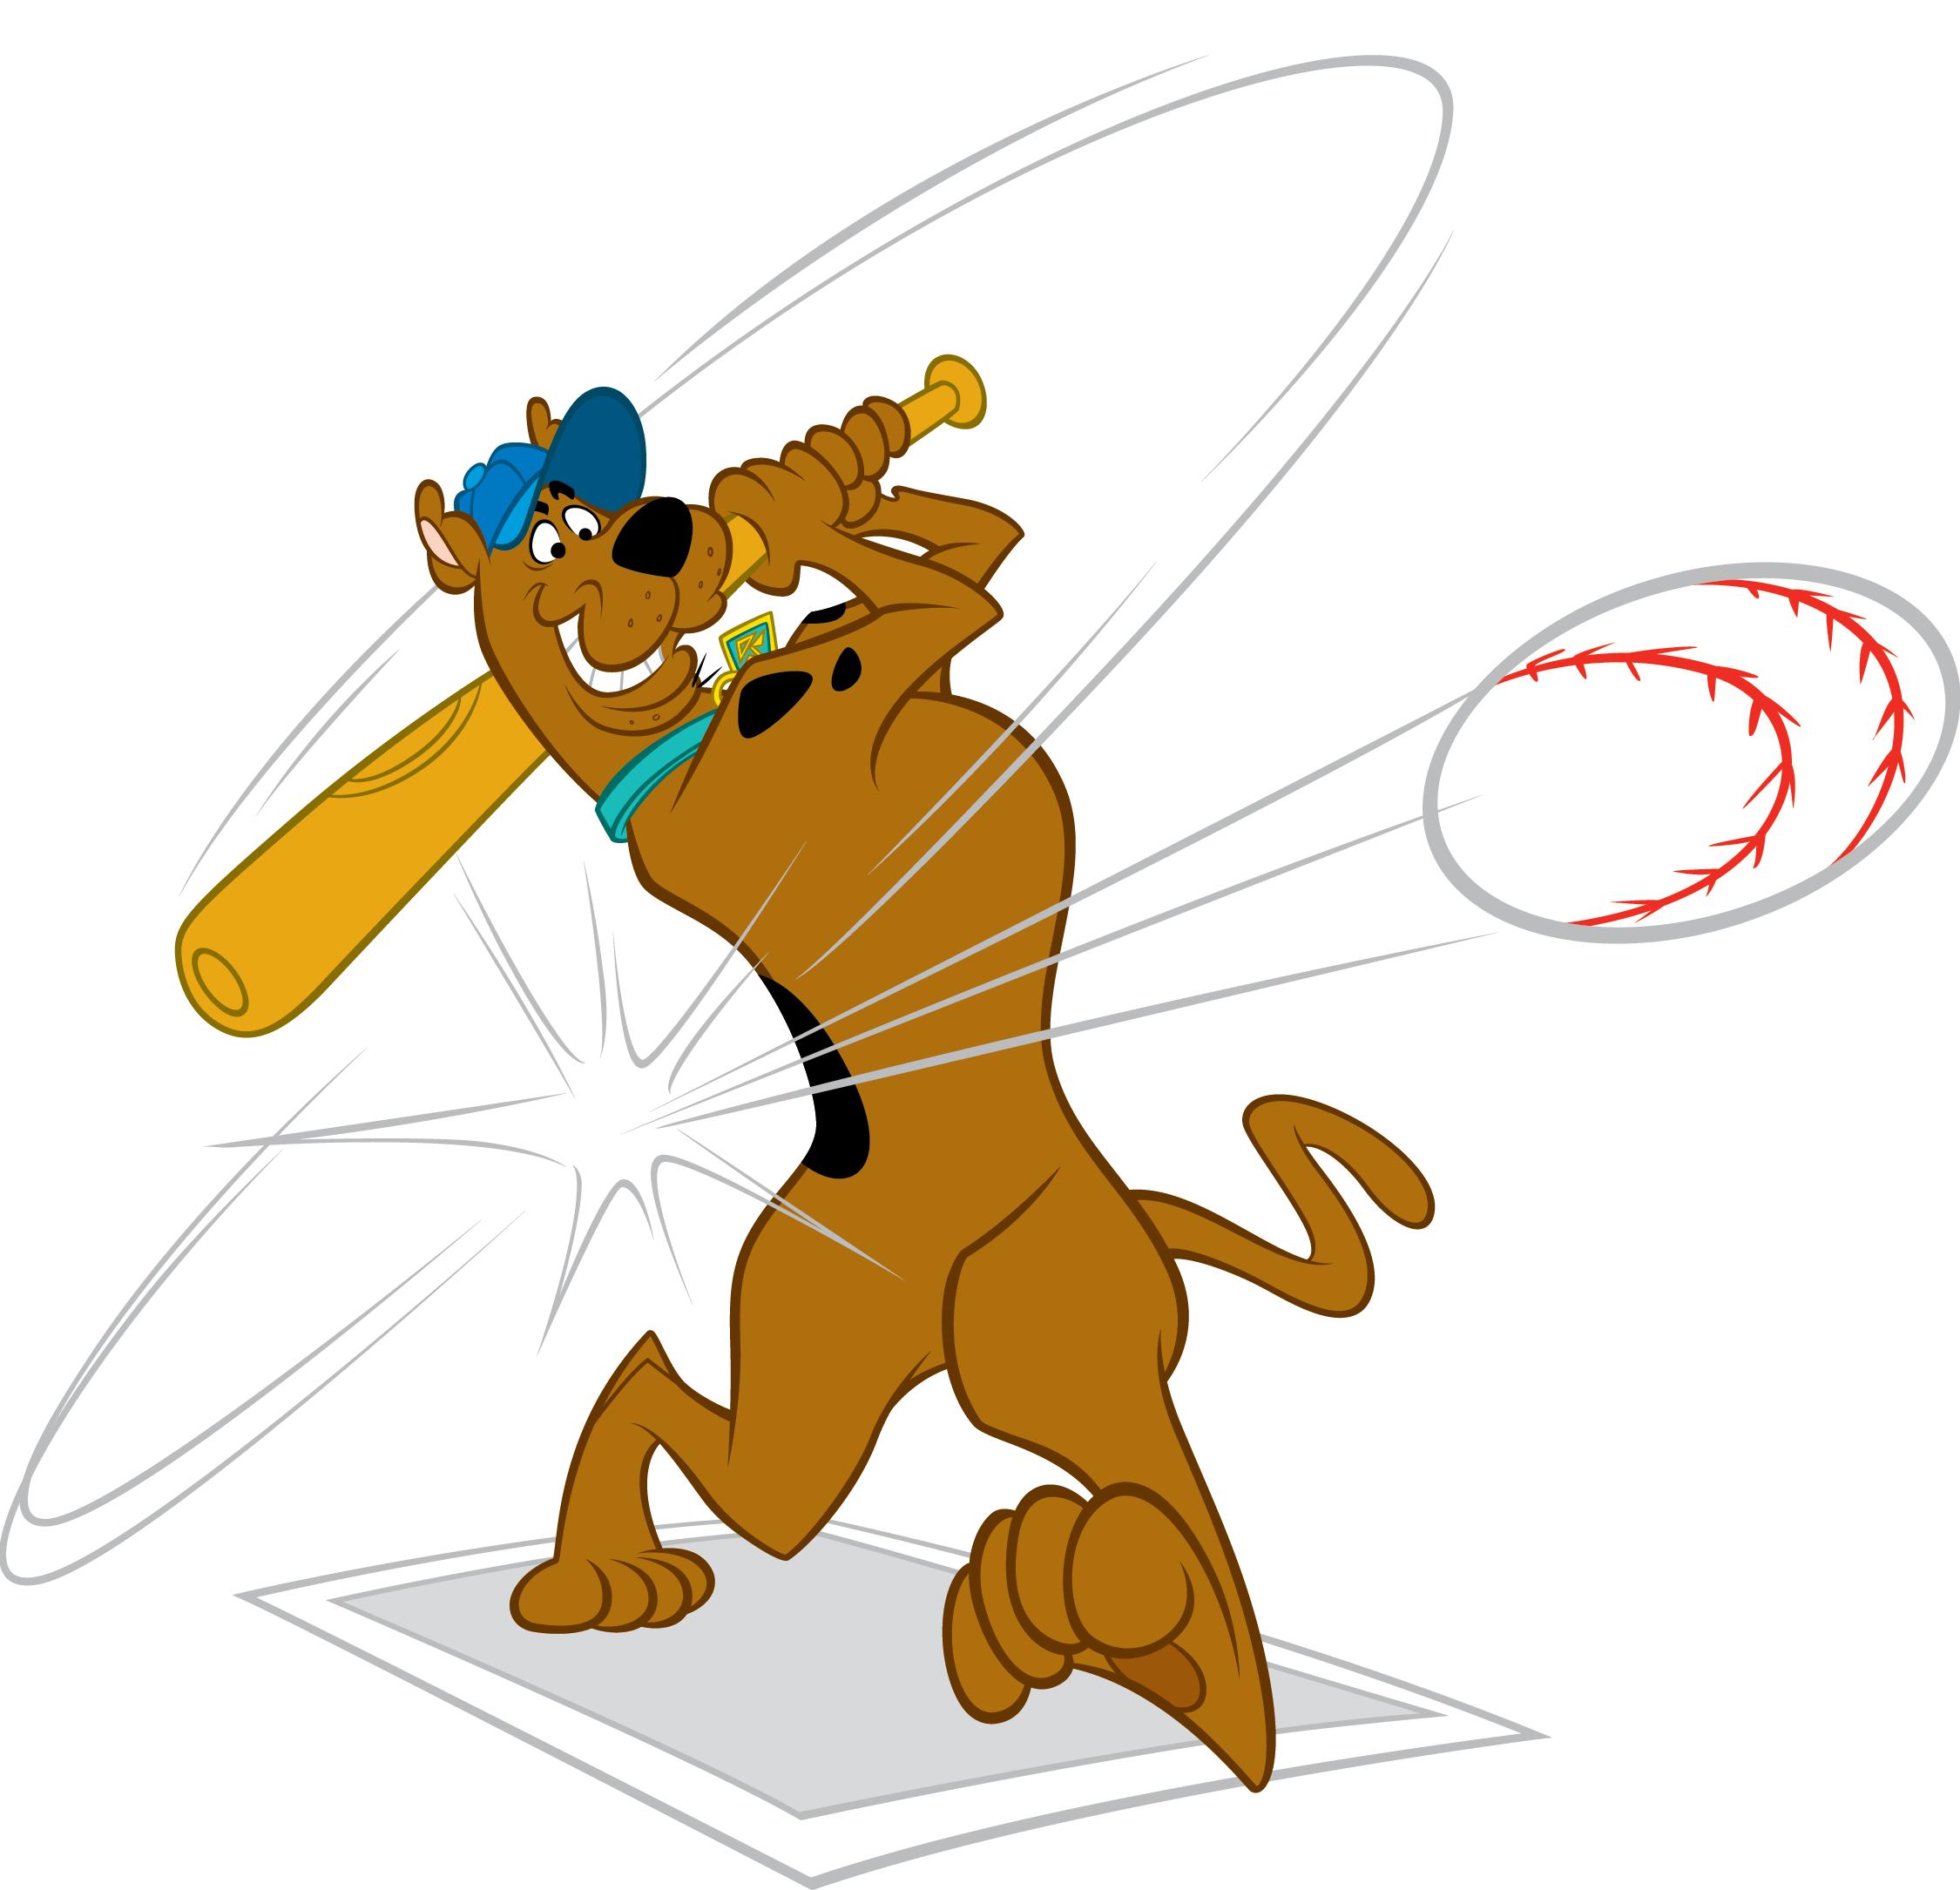 scooby doo chair office alternatives swings a homer 39s sports pinterest